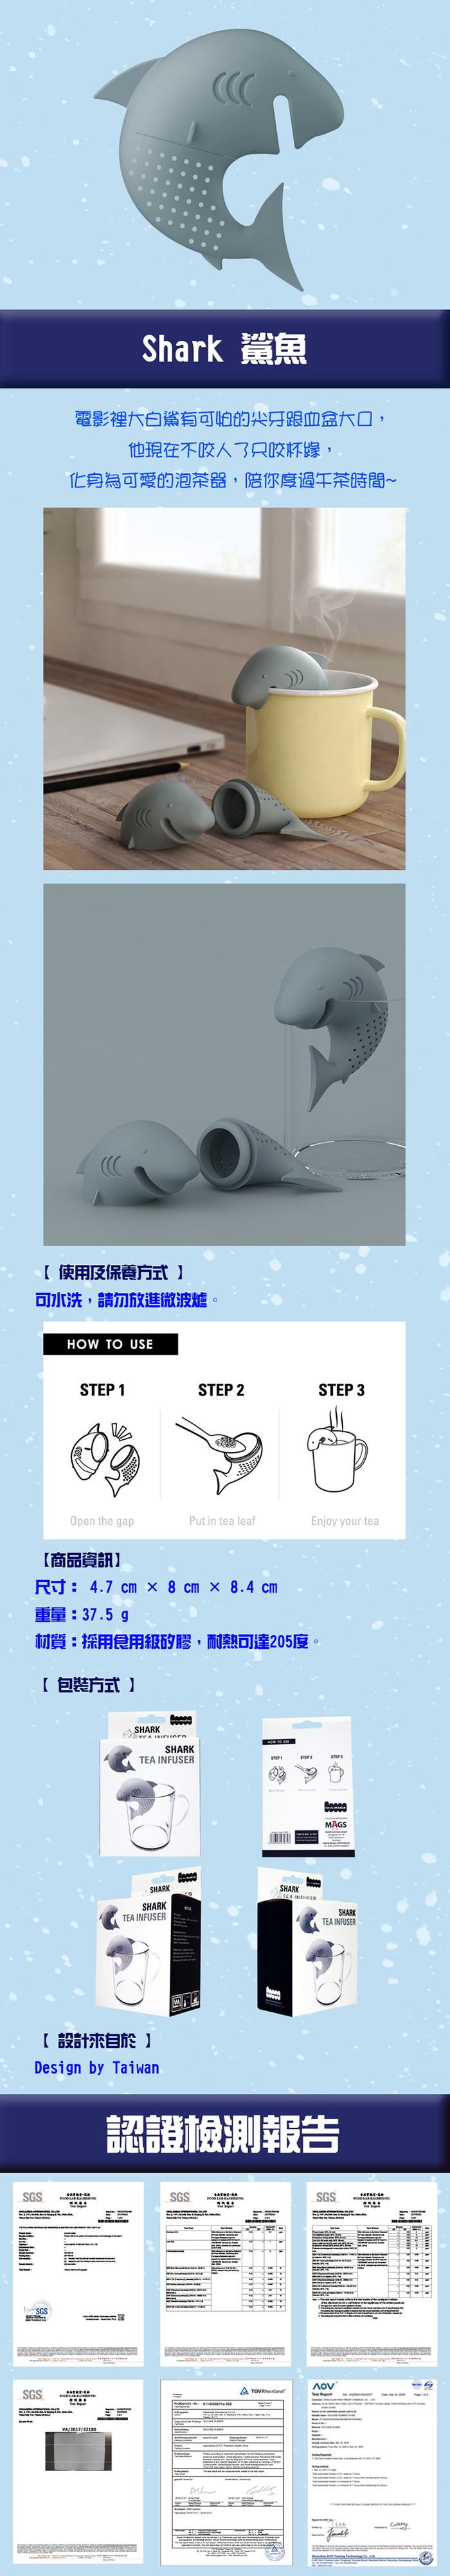 (複製)Hikalimedia|Melting ice & bears 北極熊泡茶器